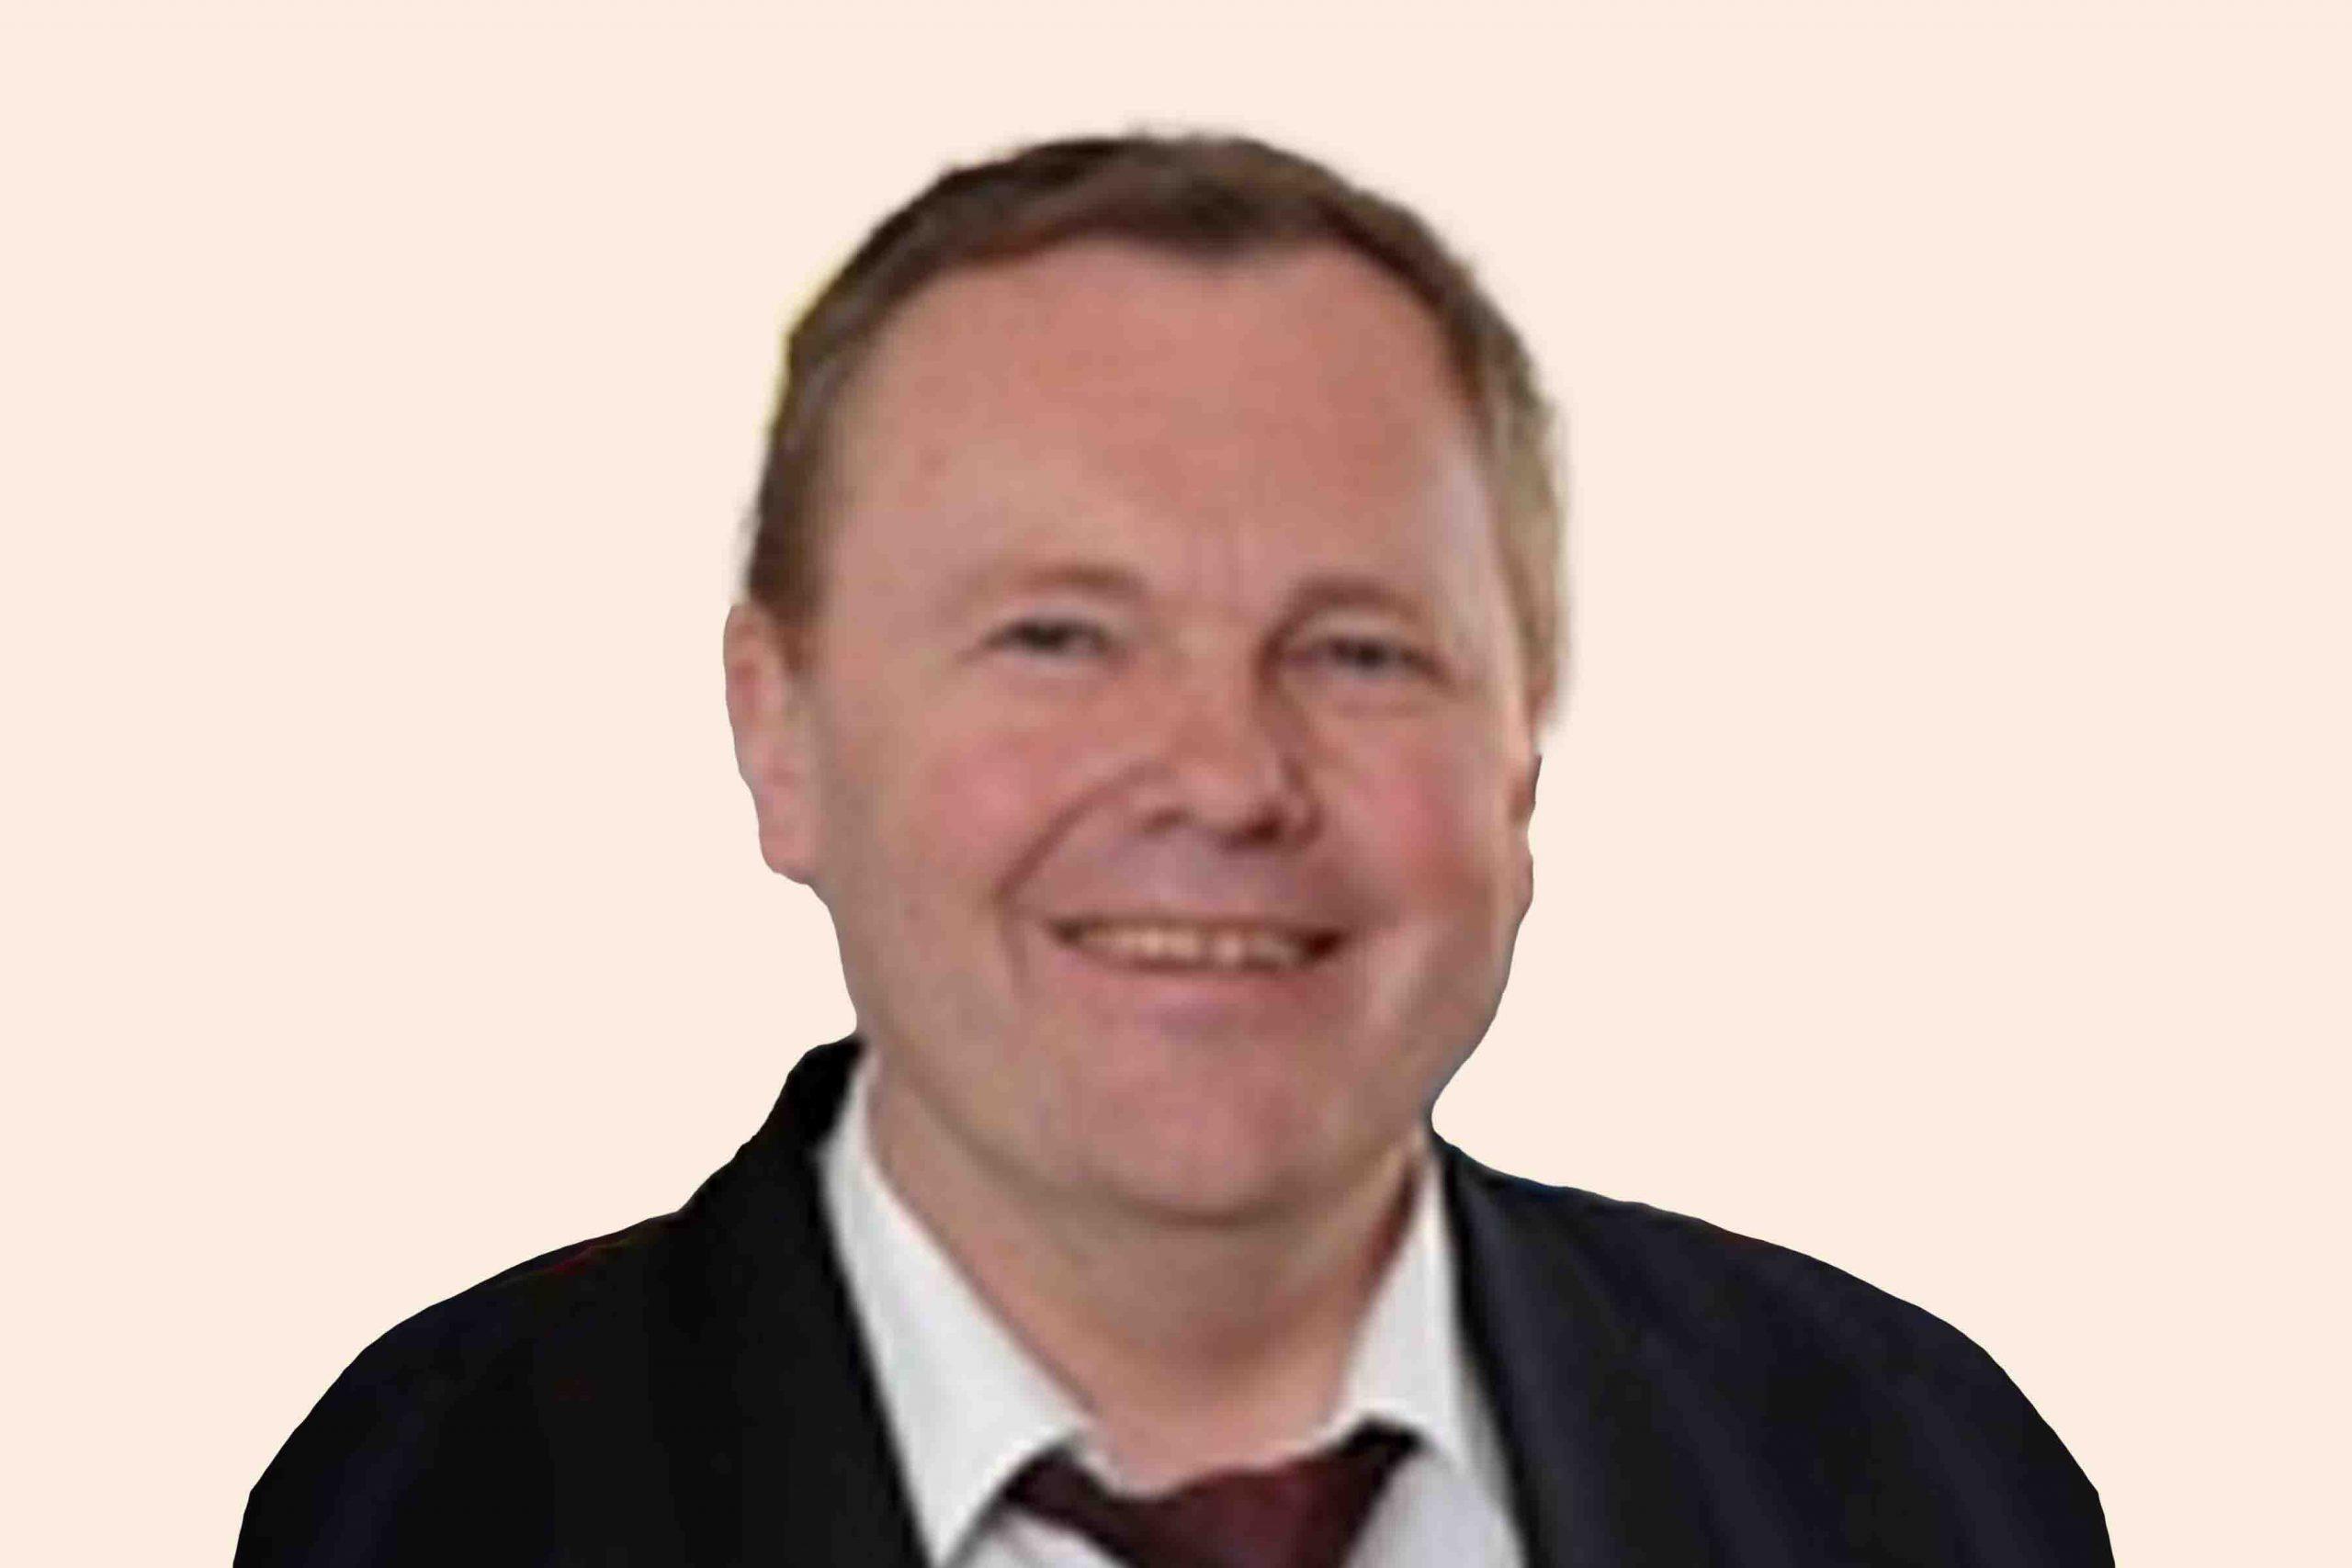 Prof. Dr. Martin Leiner